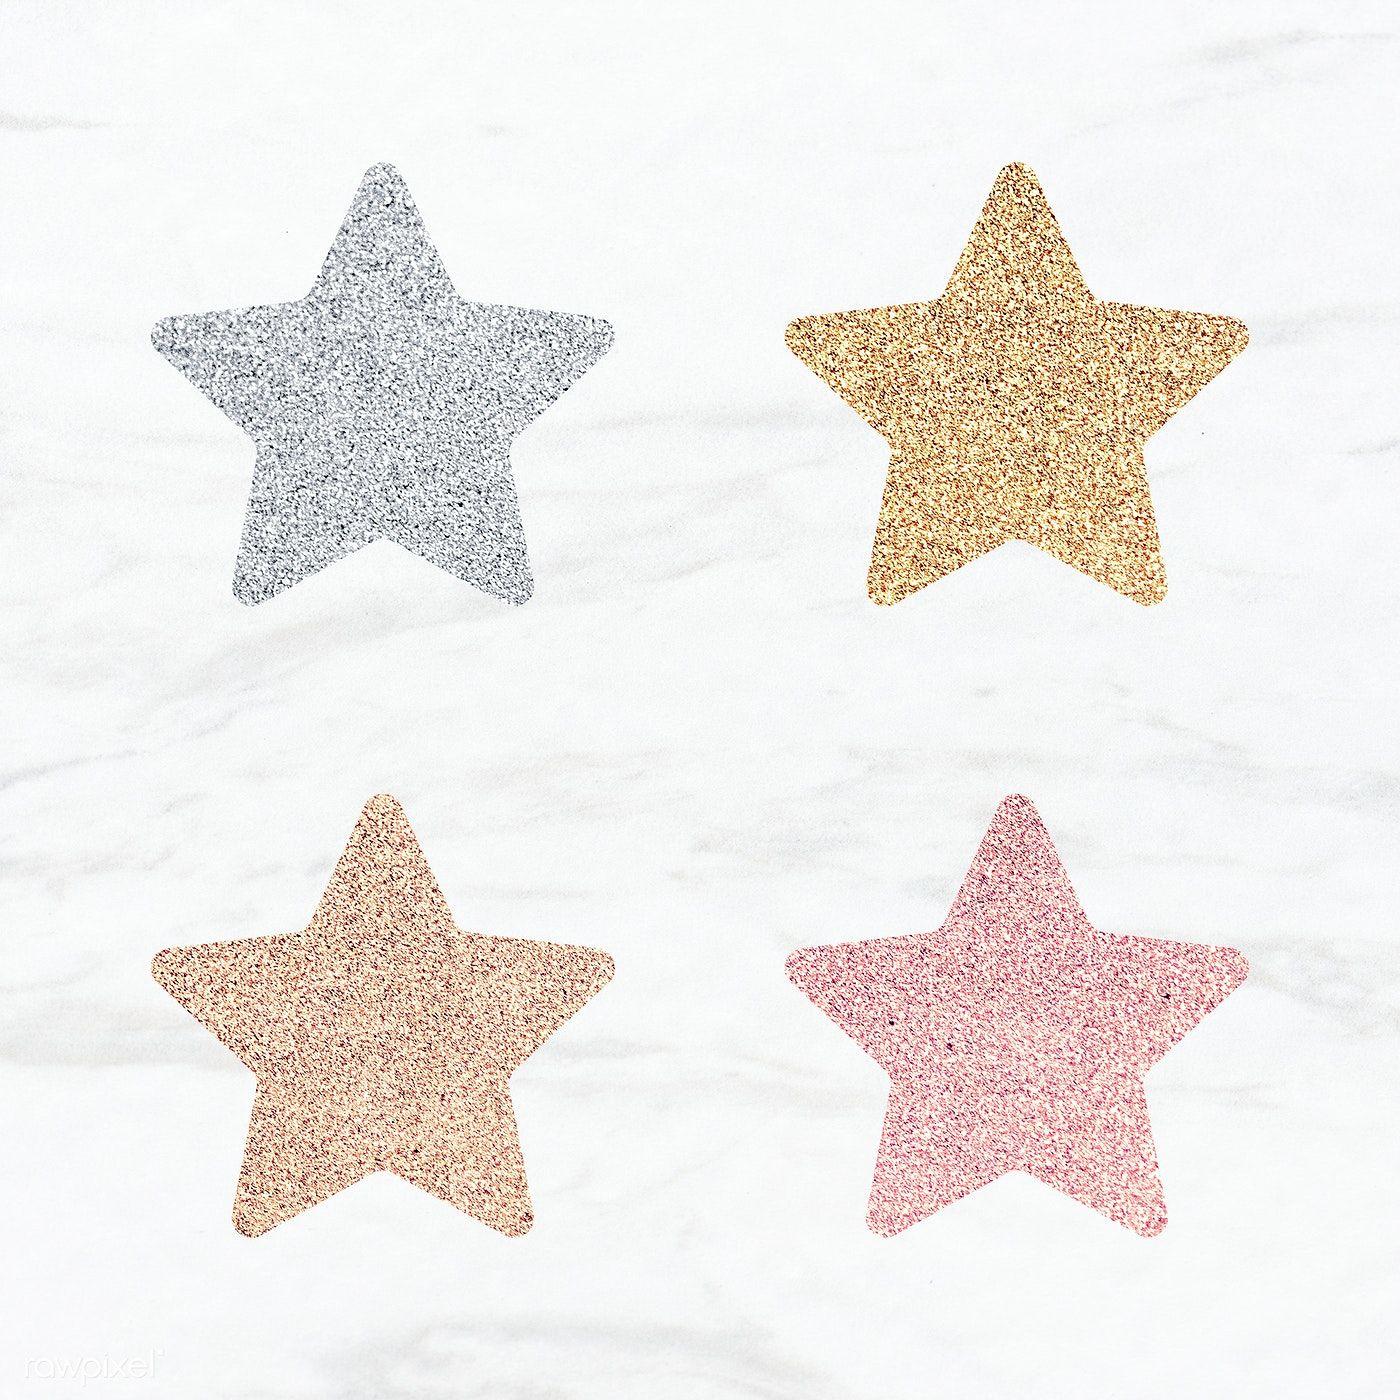 Glitter Star Sticker Set Illustration Free Image By Rawpixel Com Ningzk V Star Stickers Gold Star Stickers Pink Glitter Background